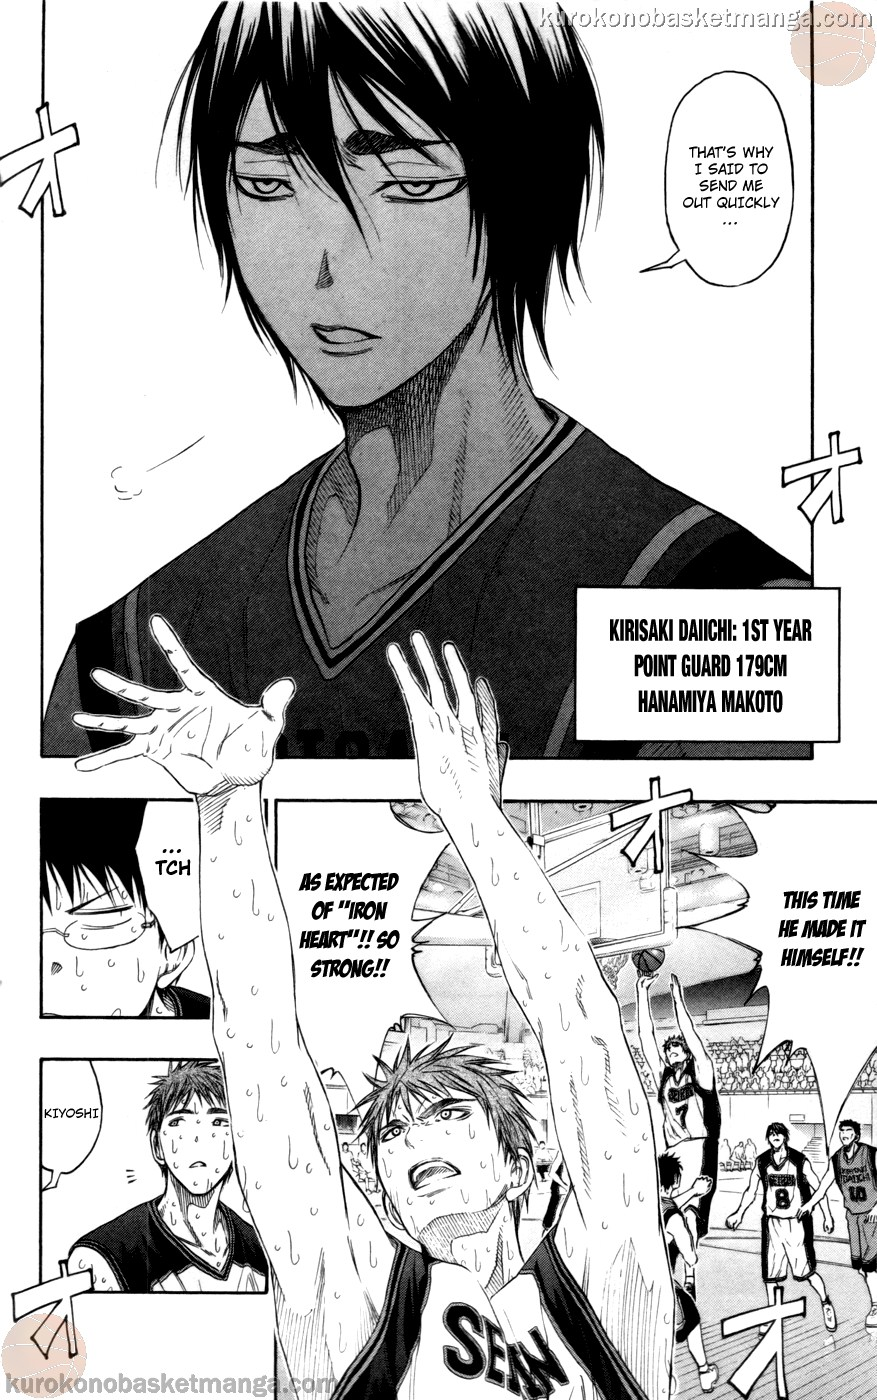 Kuroko no Basket Manga Chapter 98 - Image 17